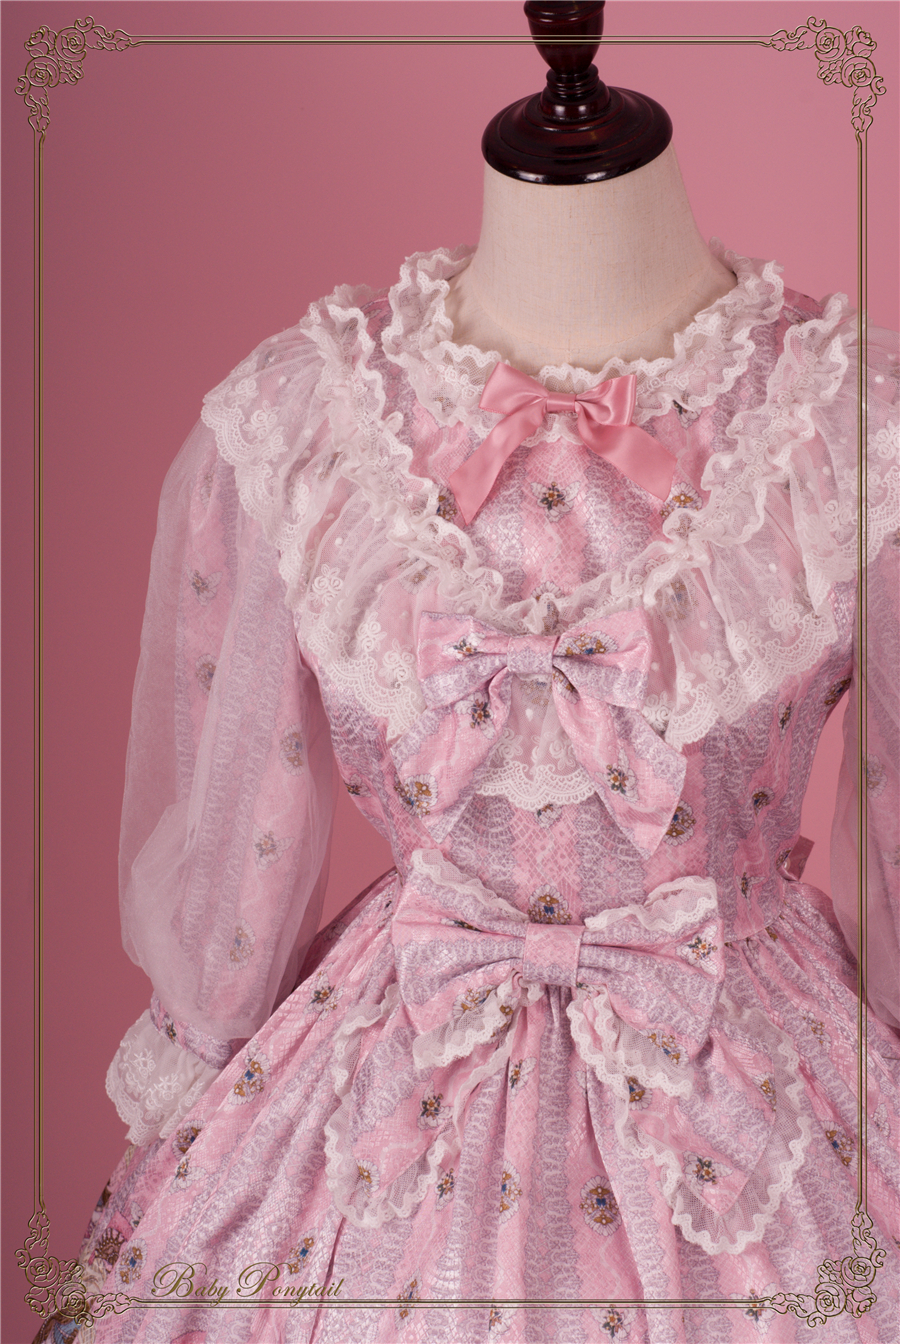 BabyPonytail_Stock Photo_My Favorite Companion_OP Pink_2.jpg